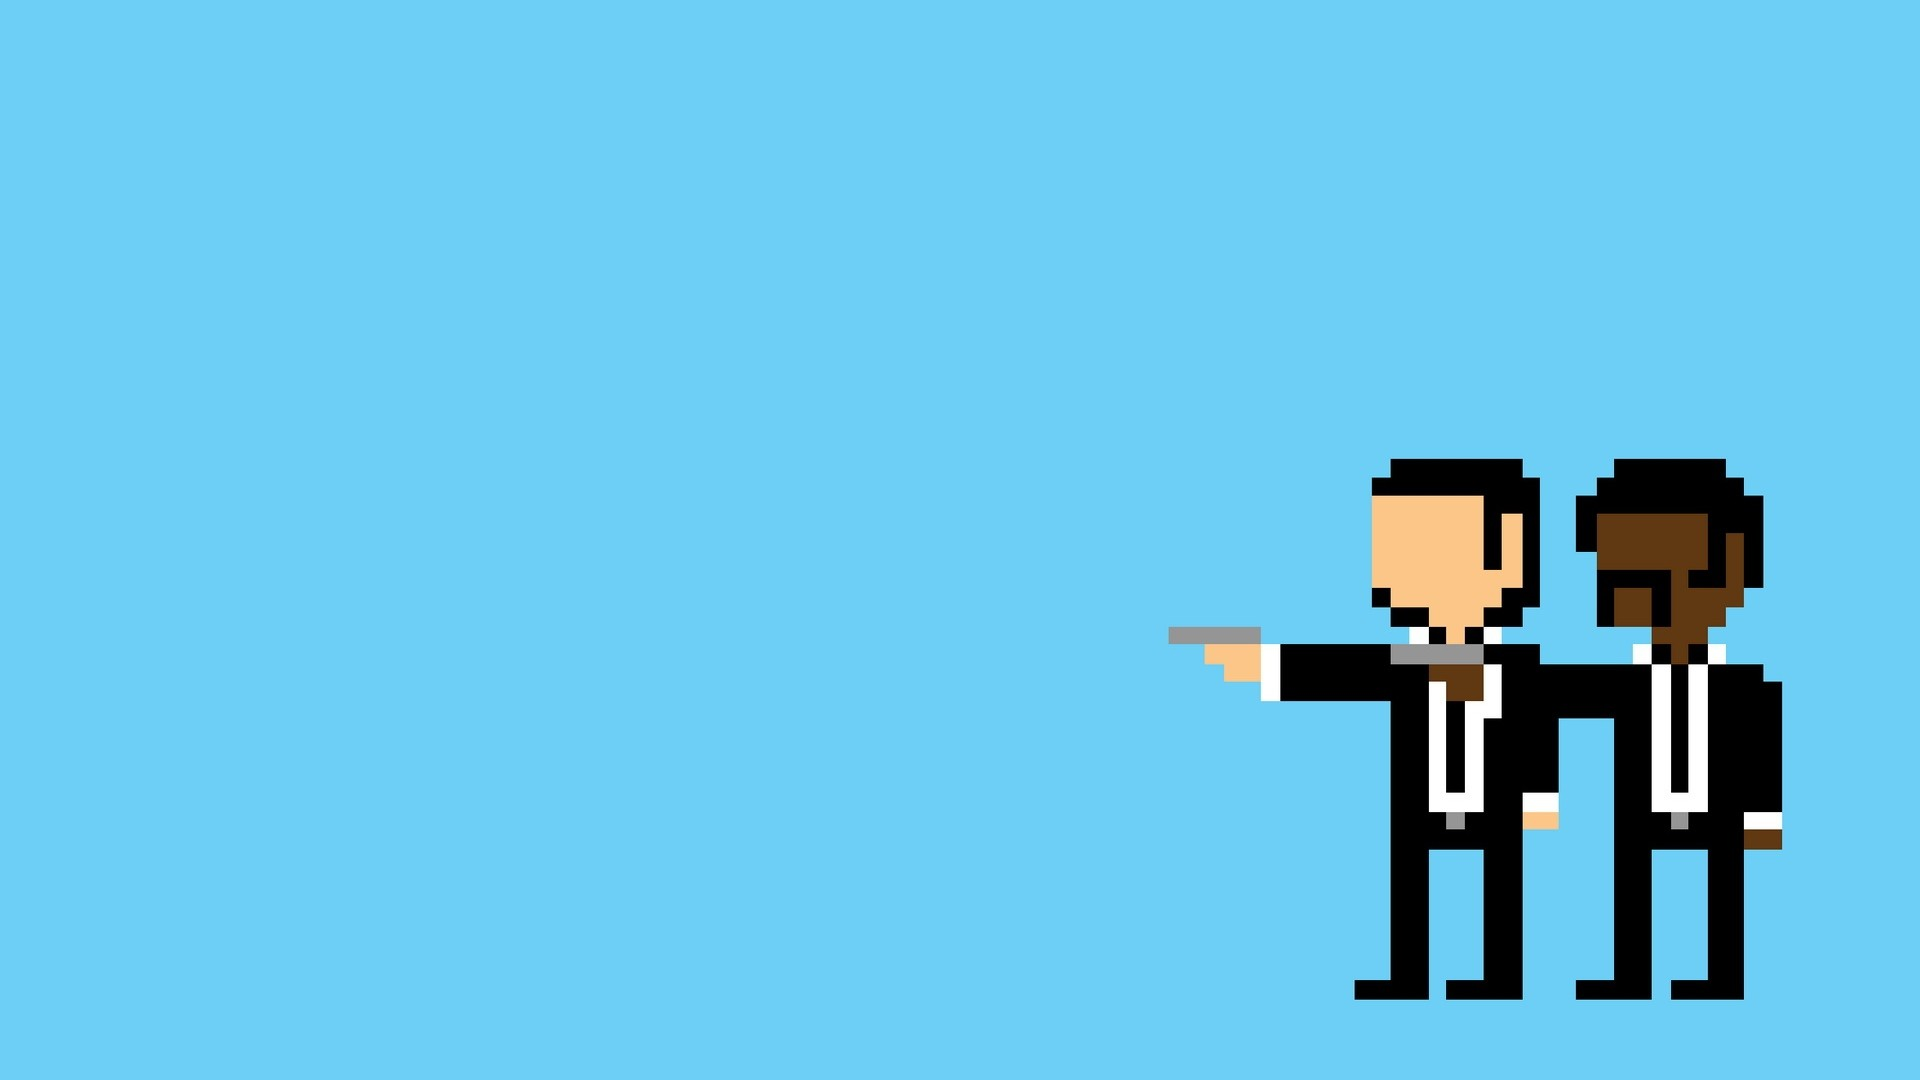 pulp pixel, people, minimalism